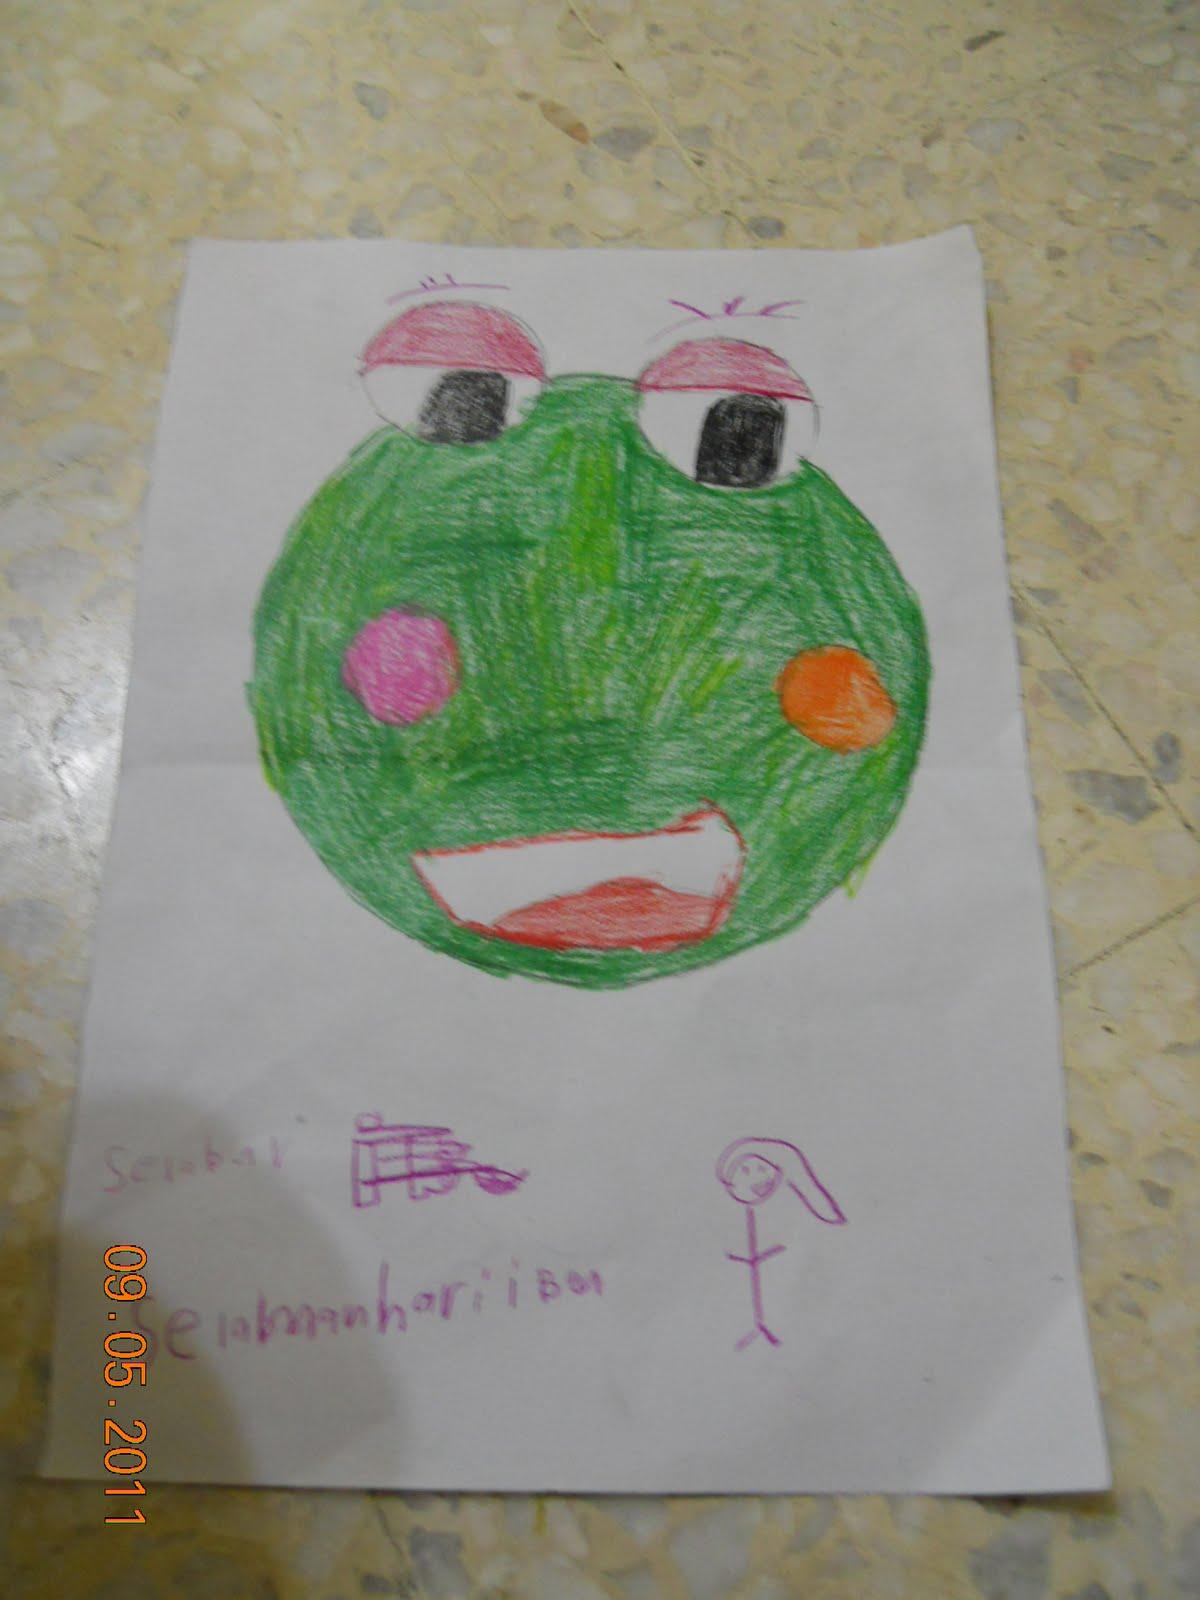 gambar katak hijau - gambar katak